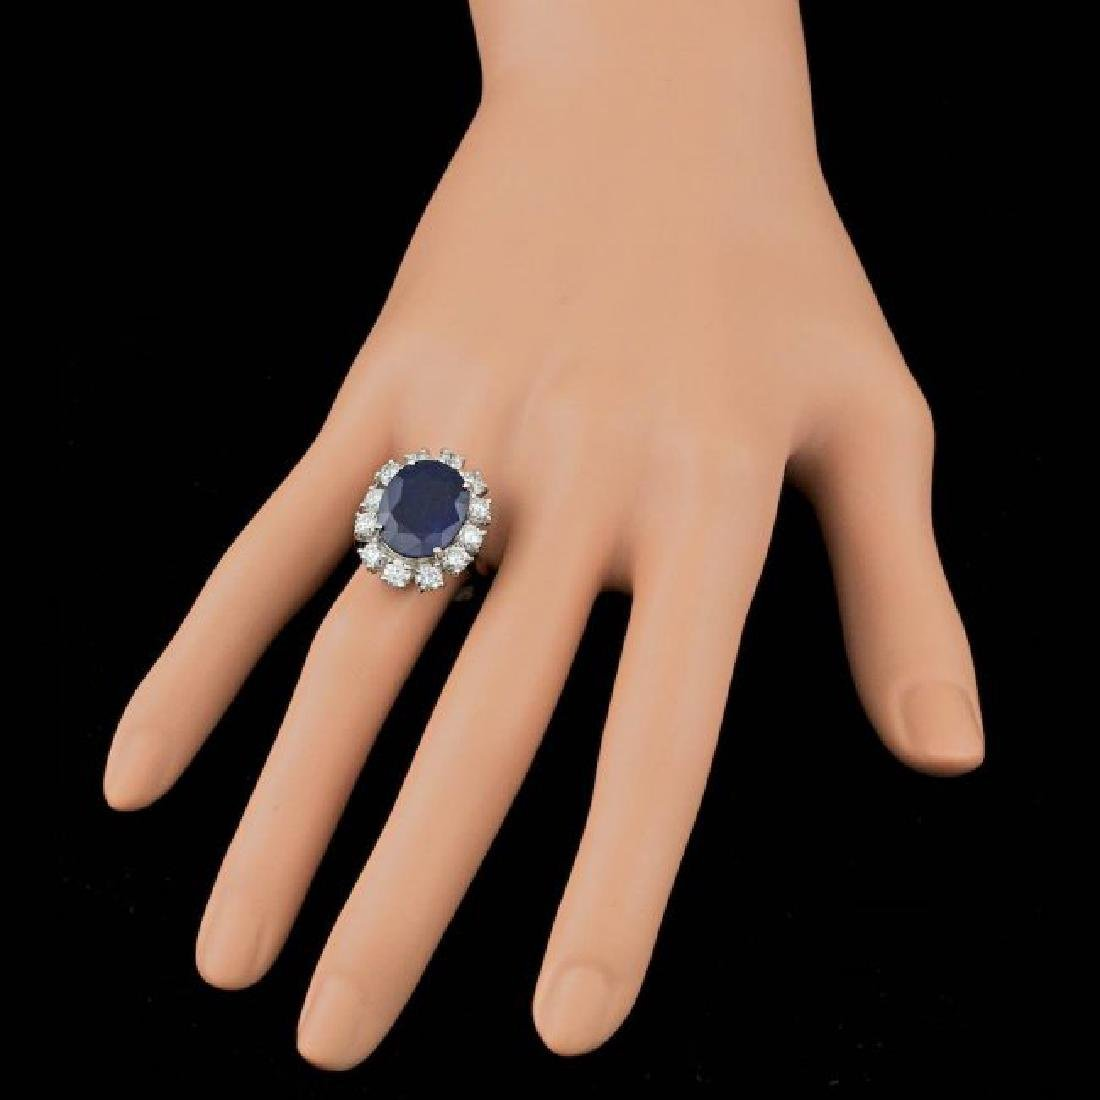 14k Gold 8.50ct Sapphire 2.30ct Diamond Ring - 3